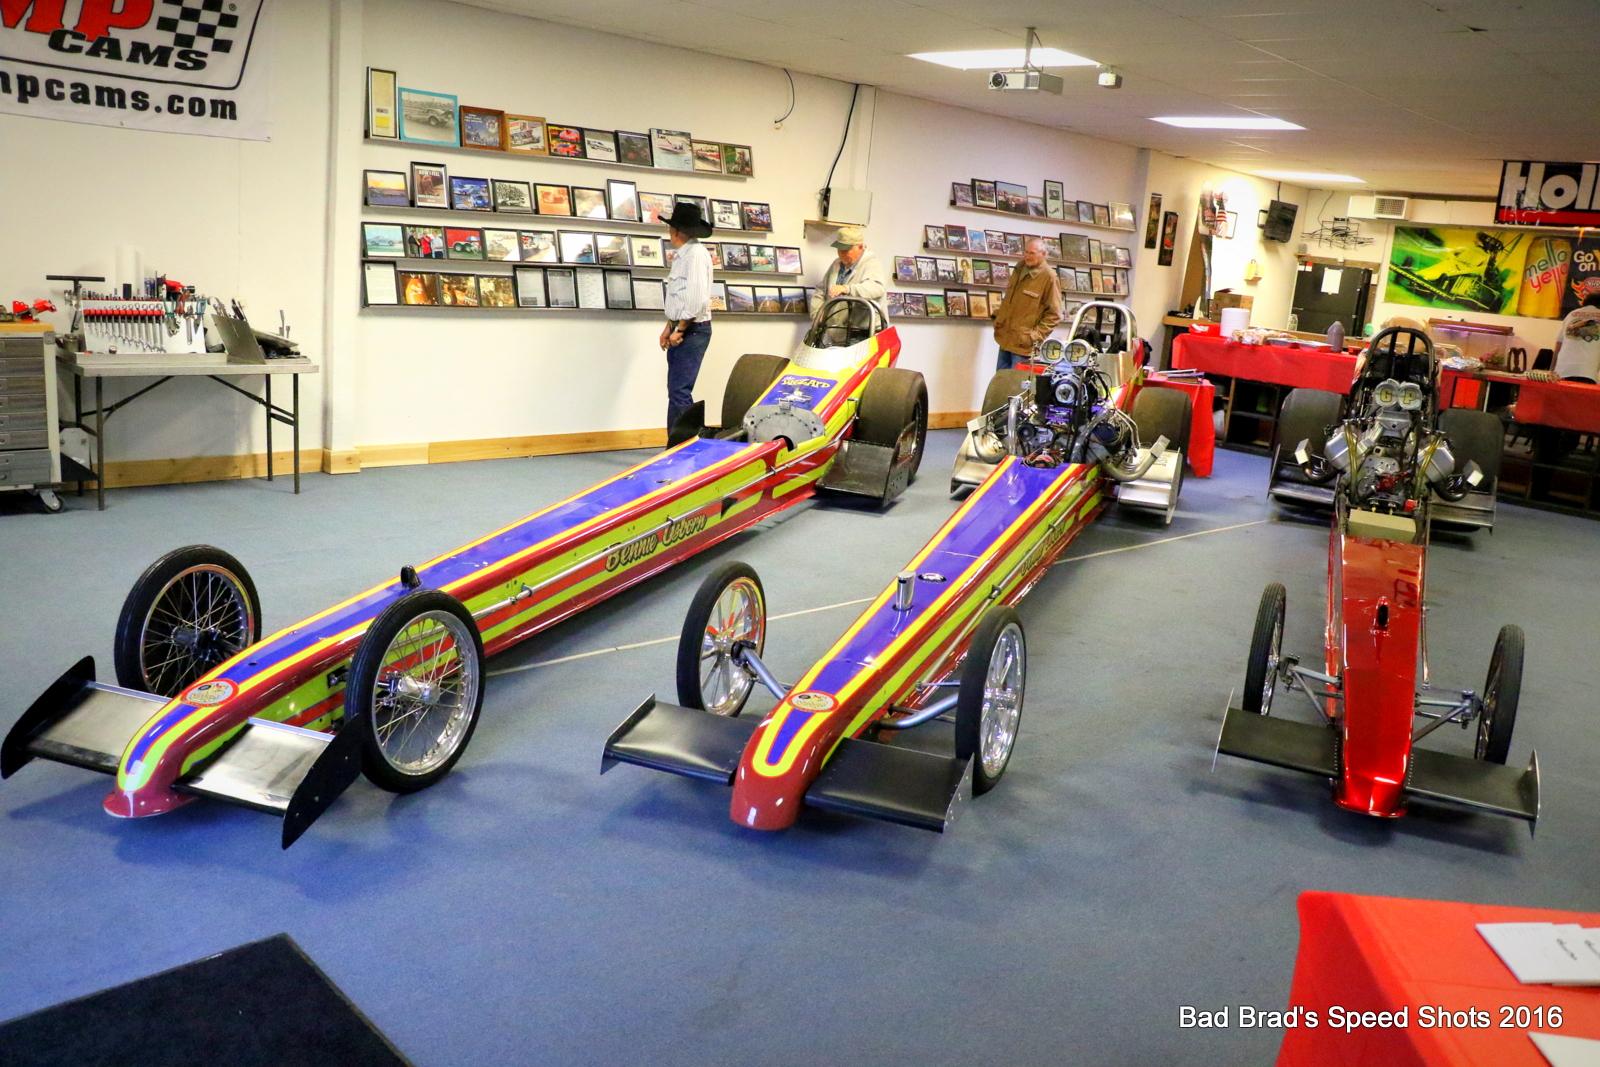 Winter Shop Tour Series: Grand Prix Auto Sports Center/Grand Prix Racing